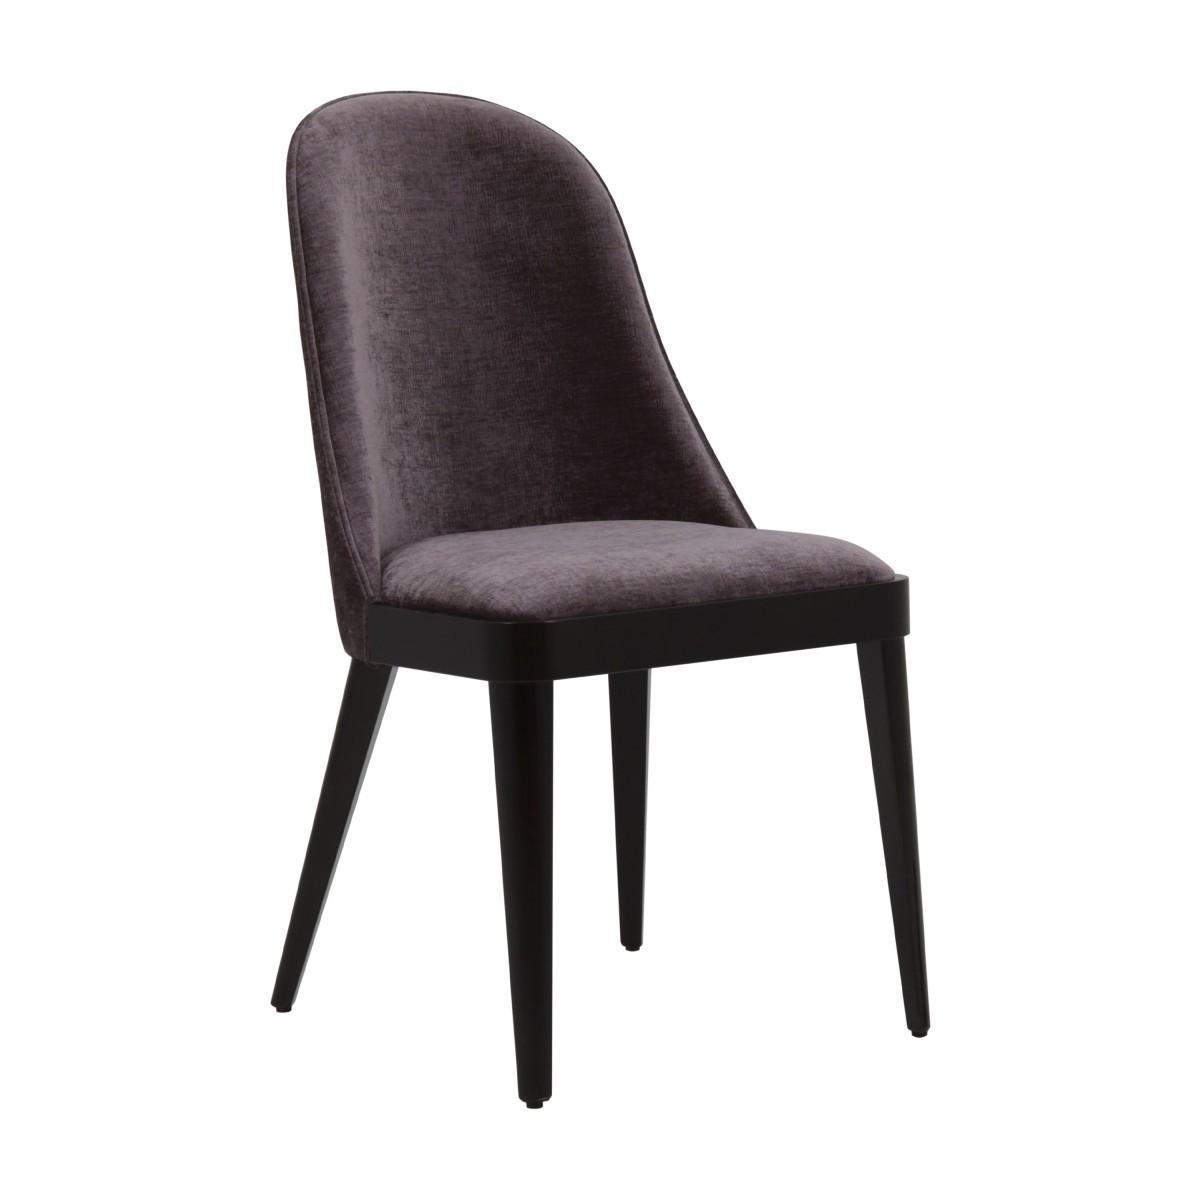 modern chair svezia 2 2345